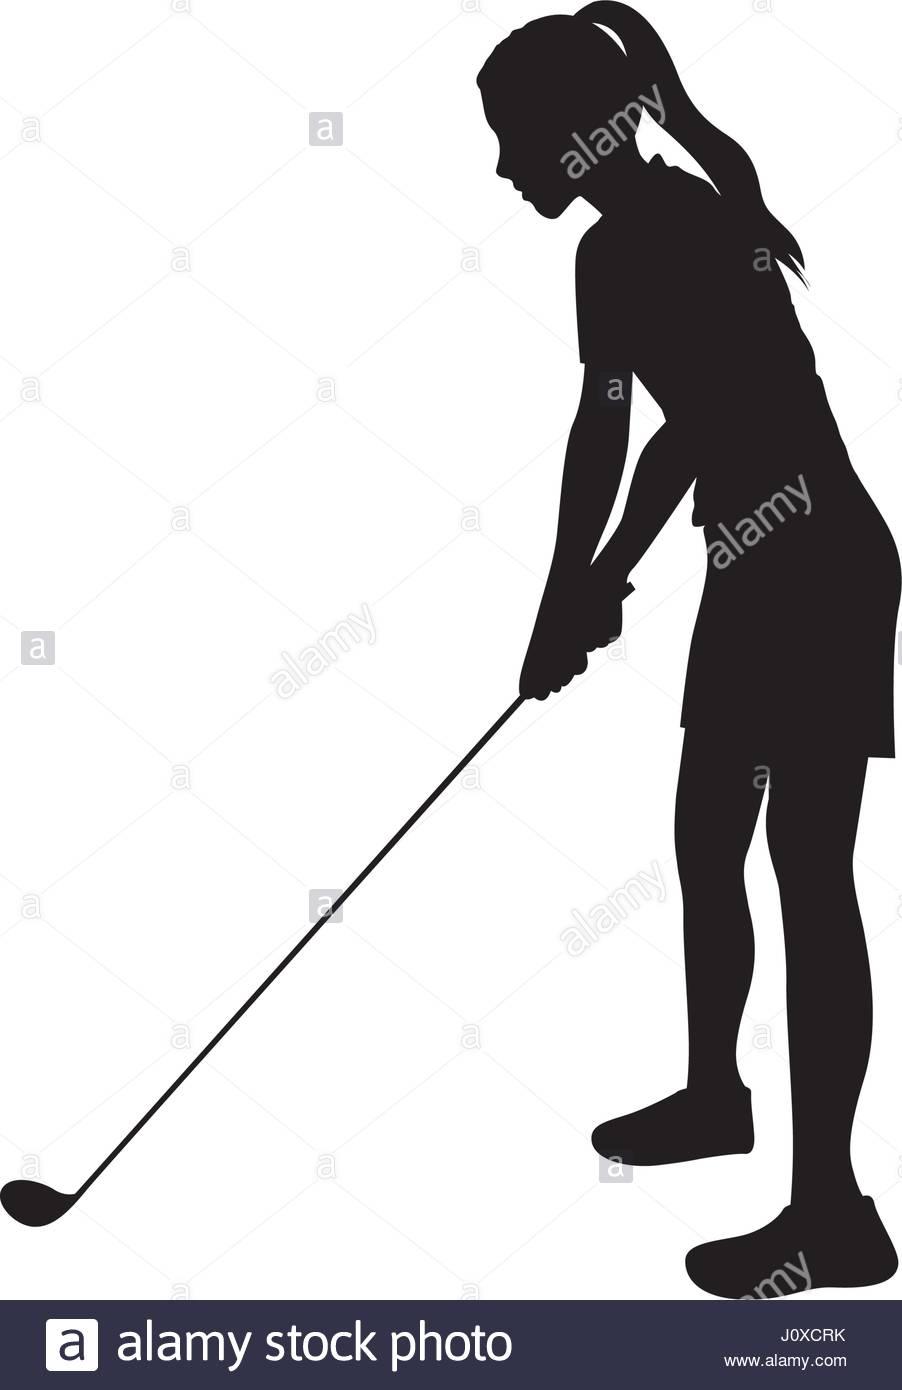 902x1390 Golfer In Silhouette Stock Photos Amp Golfer In Silhouette Stock